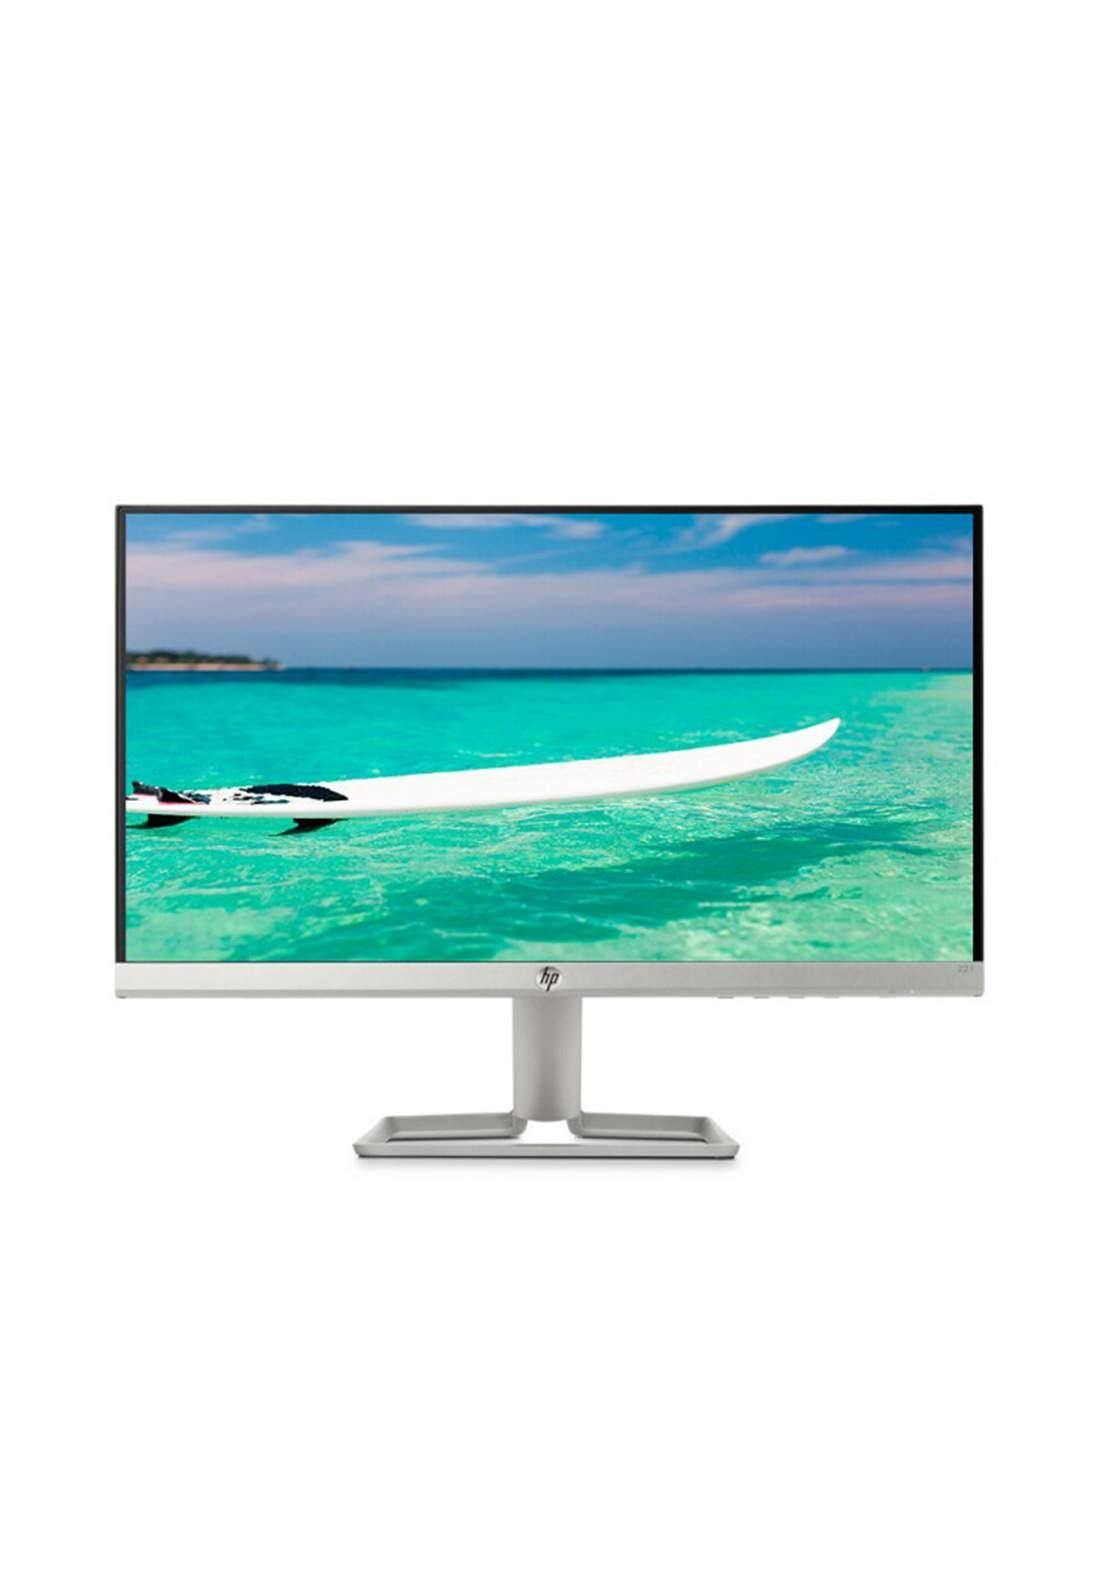 HP 27f 27-inch Display Full HD - Silver